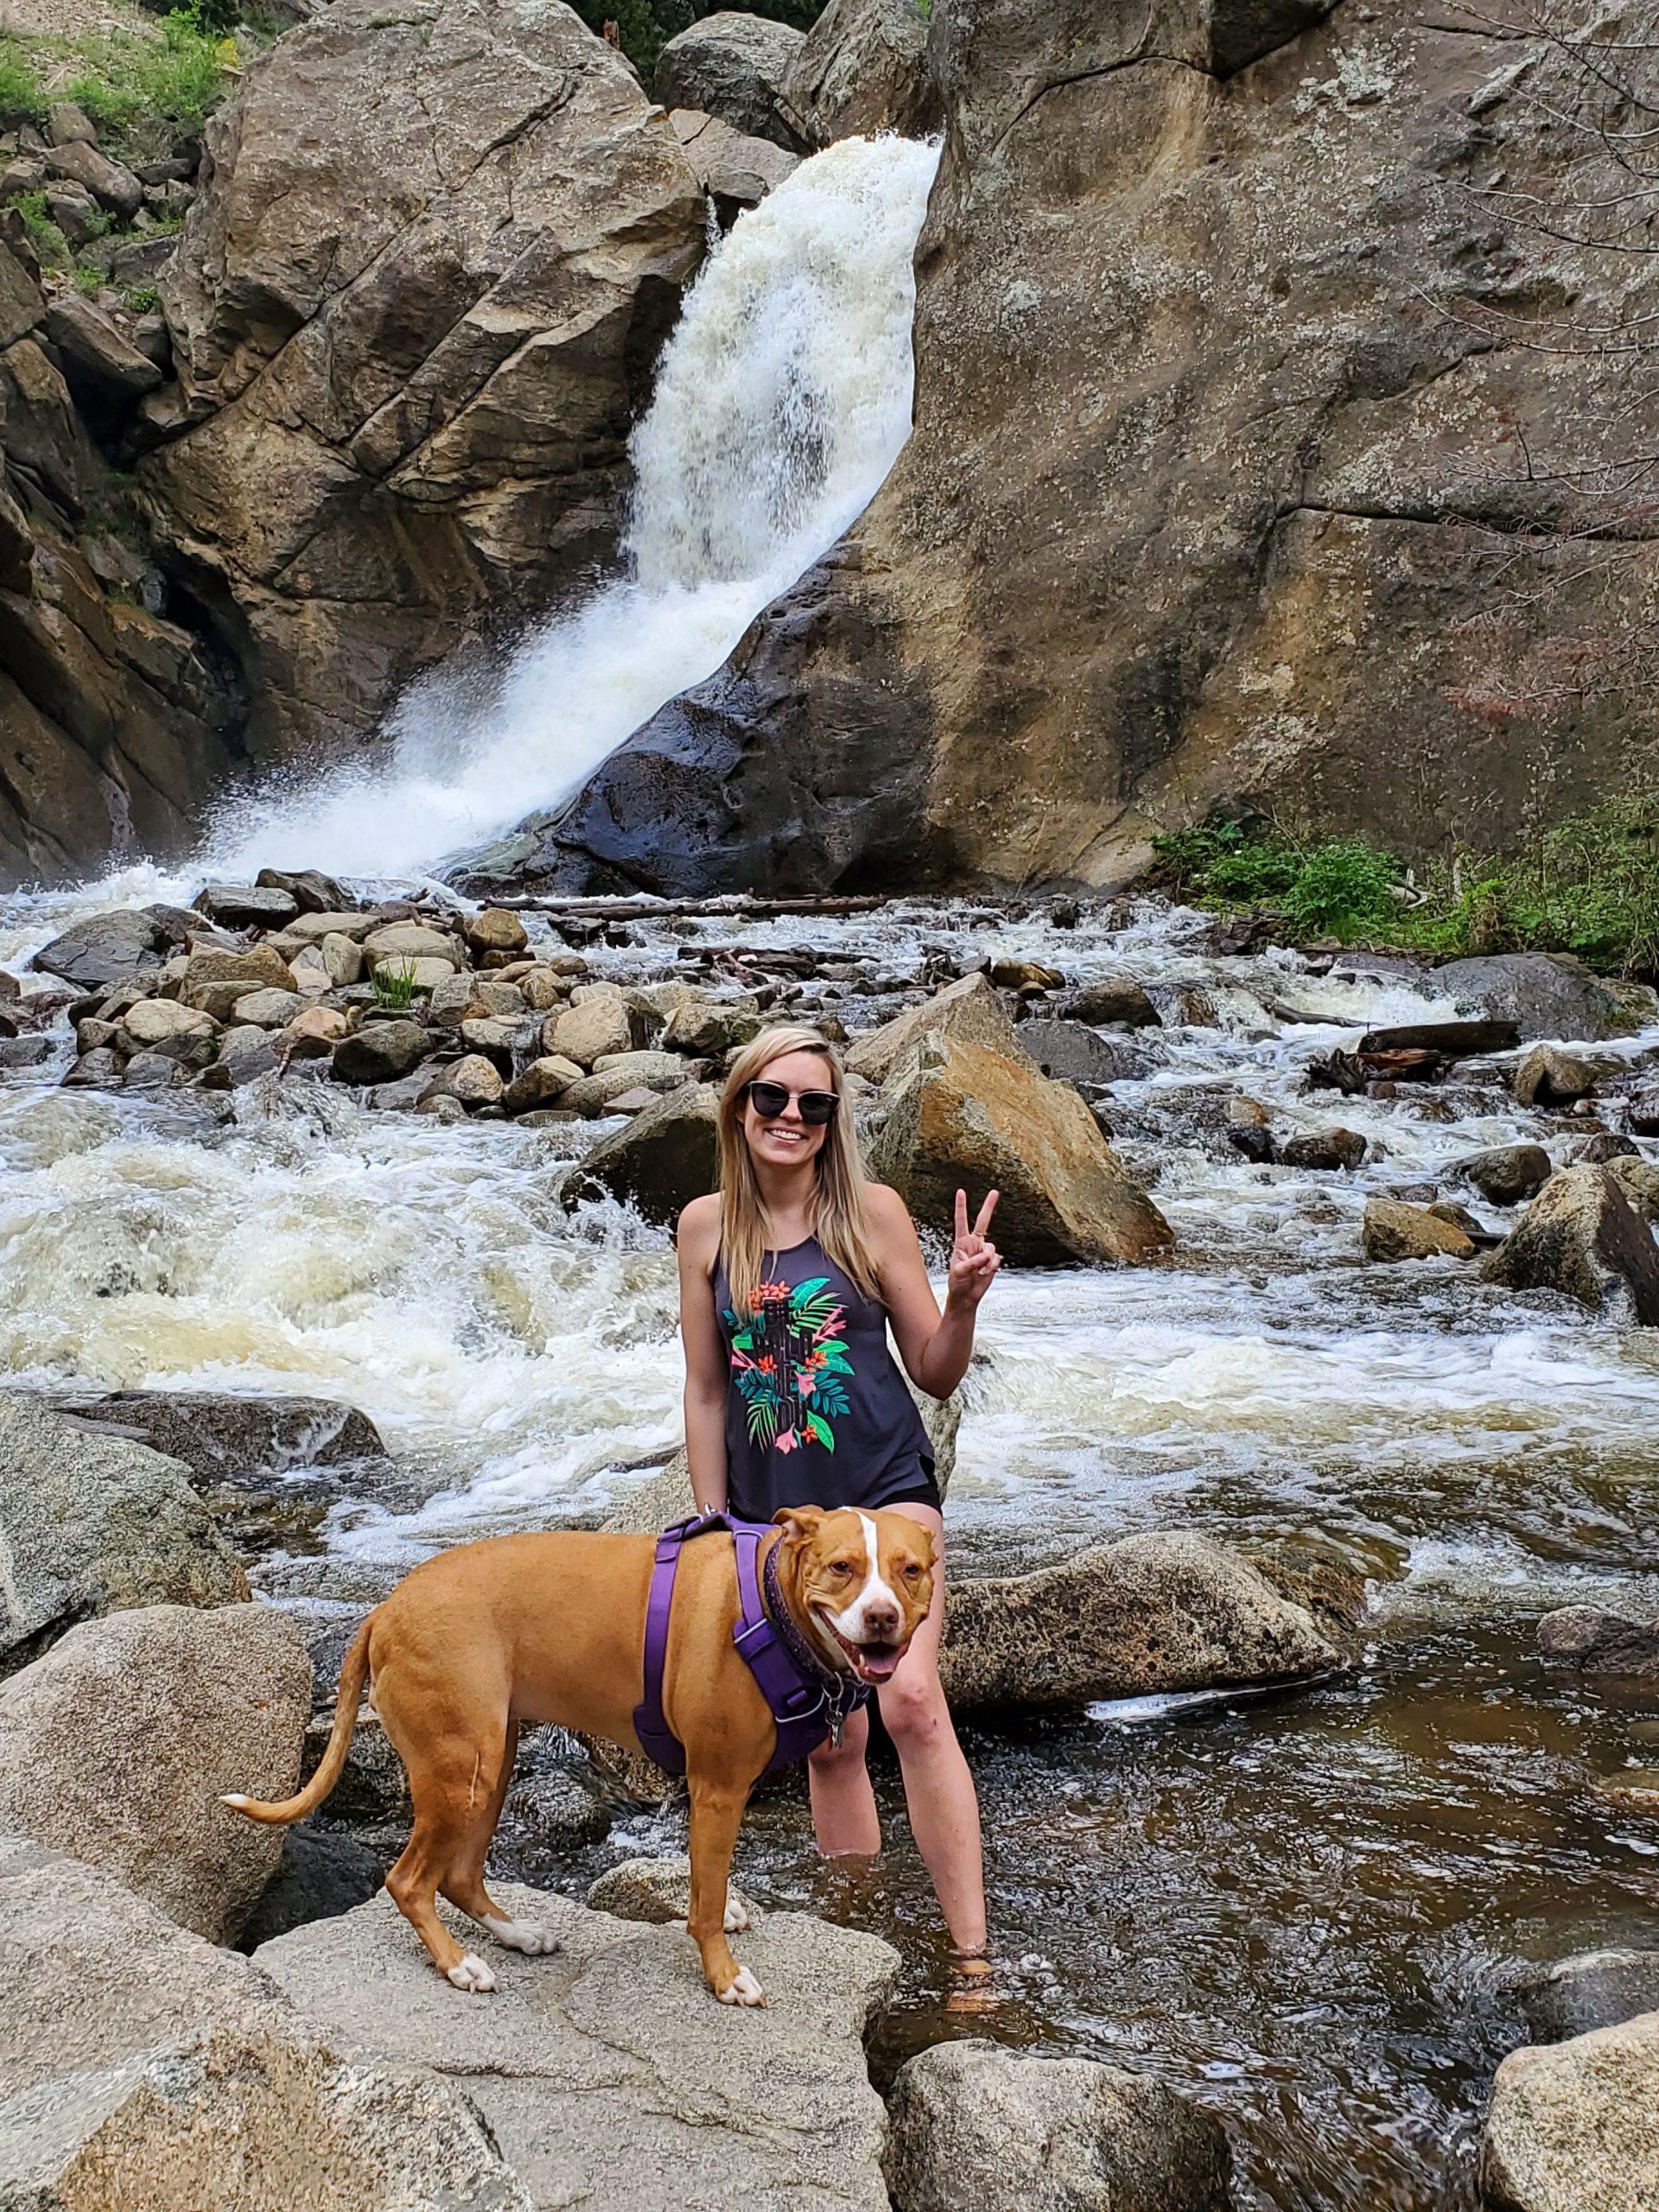 Mandi - Pet Sitter and Dog Walker for Sit Stay Play in Tulsa, Oklahoma - Pet Sitting Tulsa - Dog Walking Tulsa